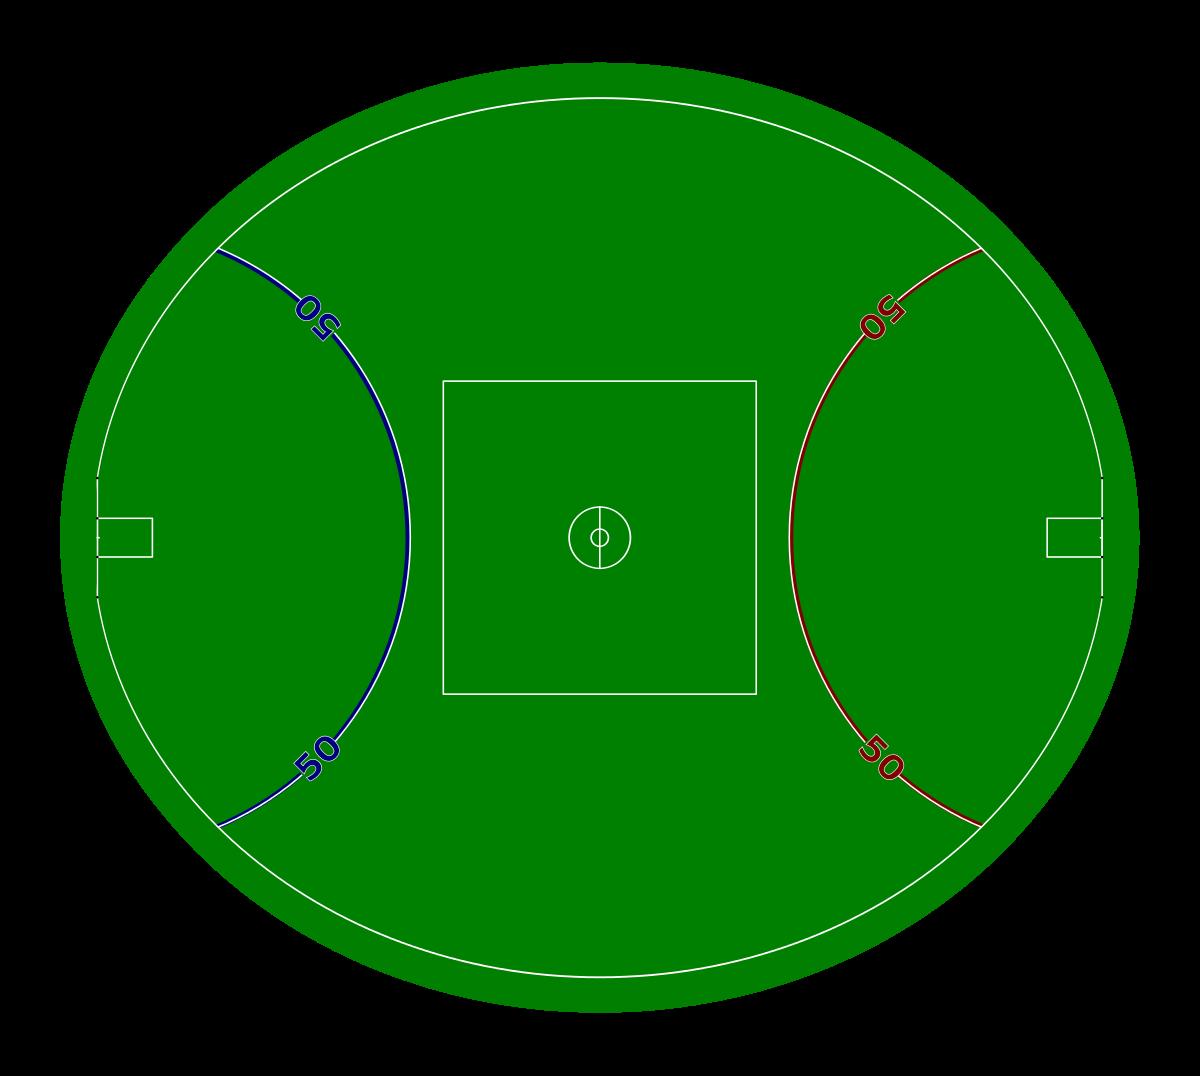 1200x1076 Australian Rules Football Playing Field